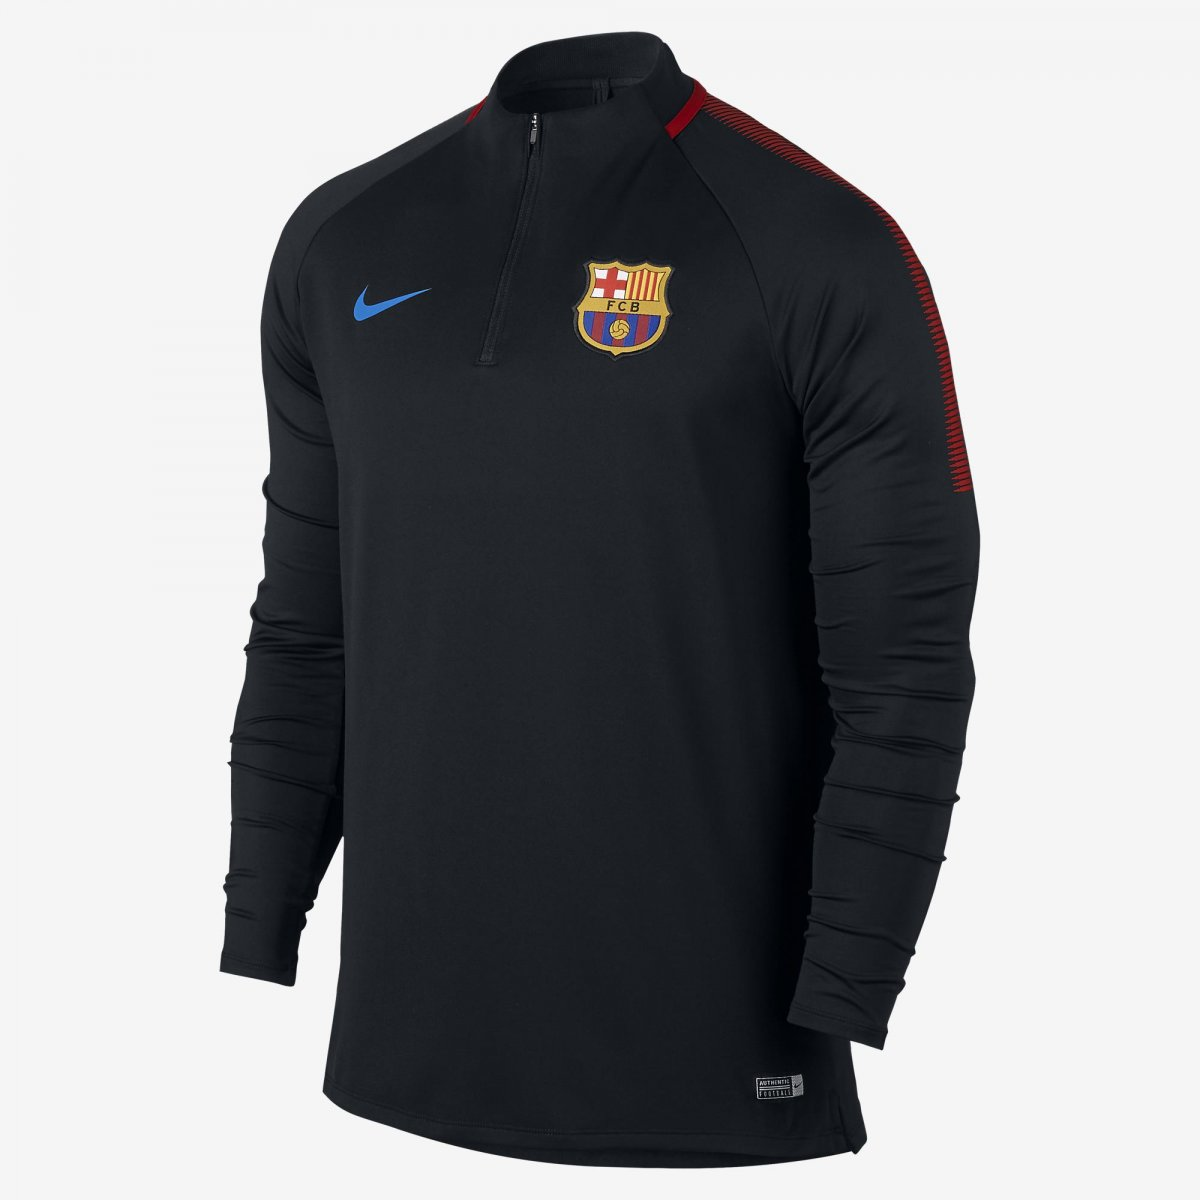 Camiseta Nike Barcelona Squad Dril Top Masculina 854191-011 Preto  (Poliéster) b55be135b102e